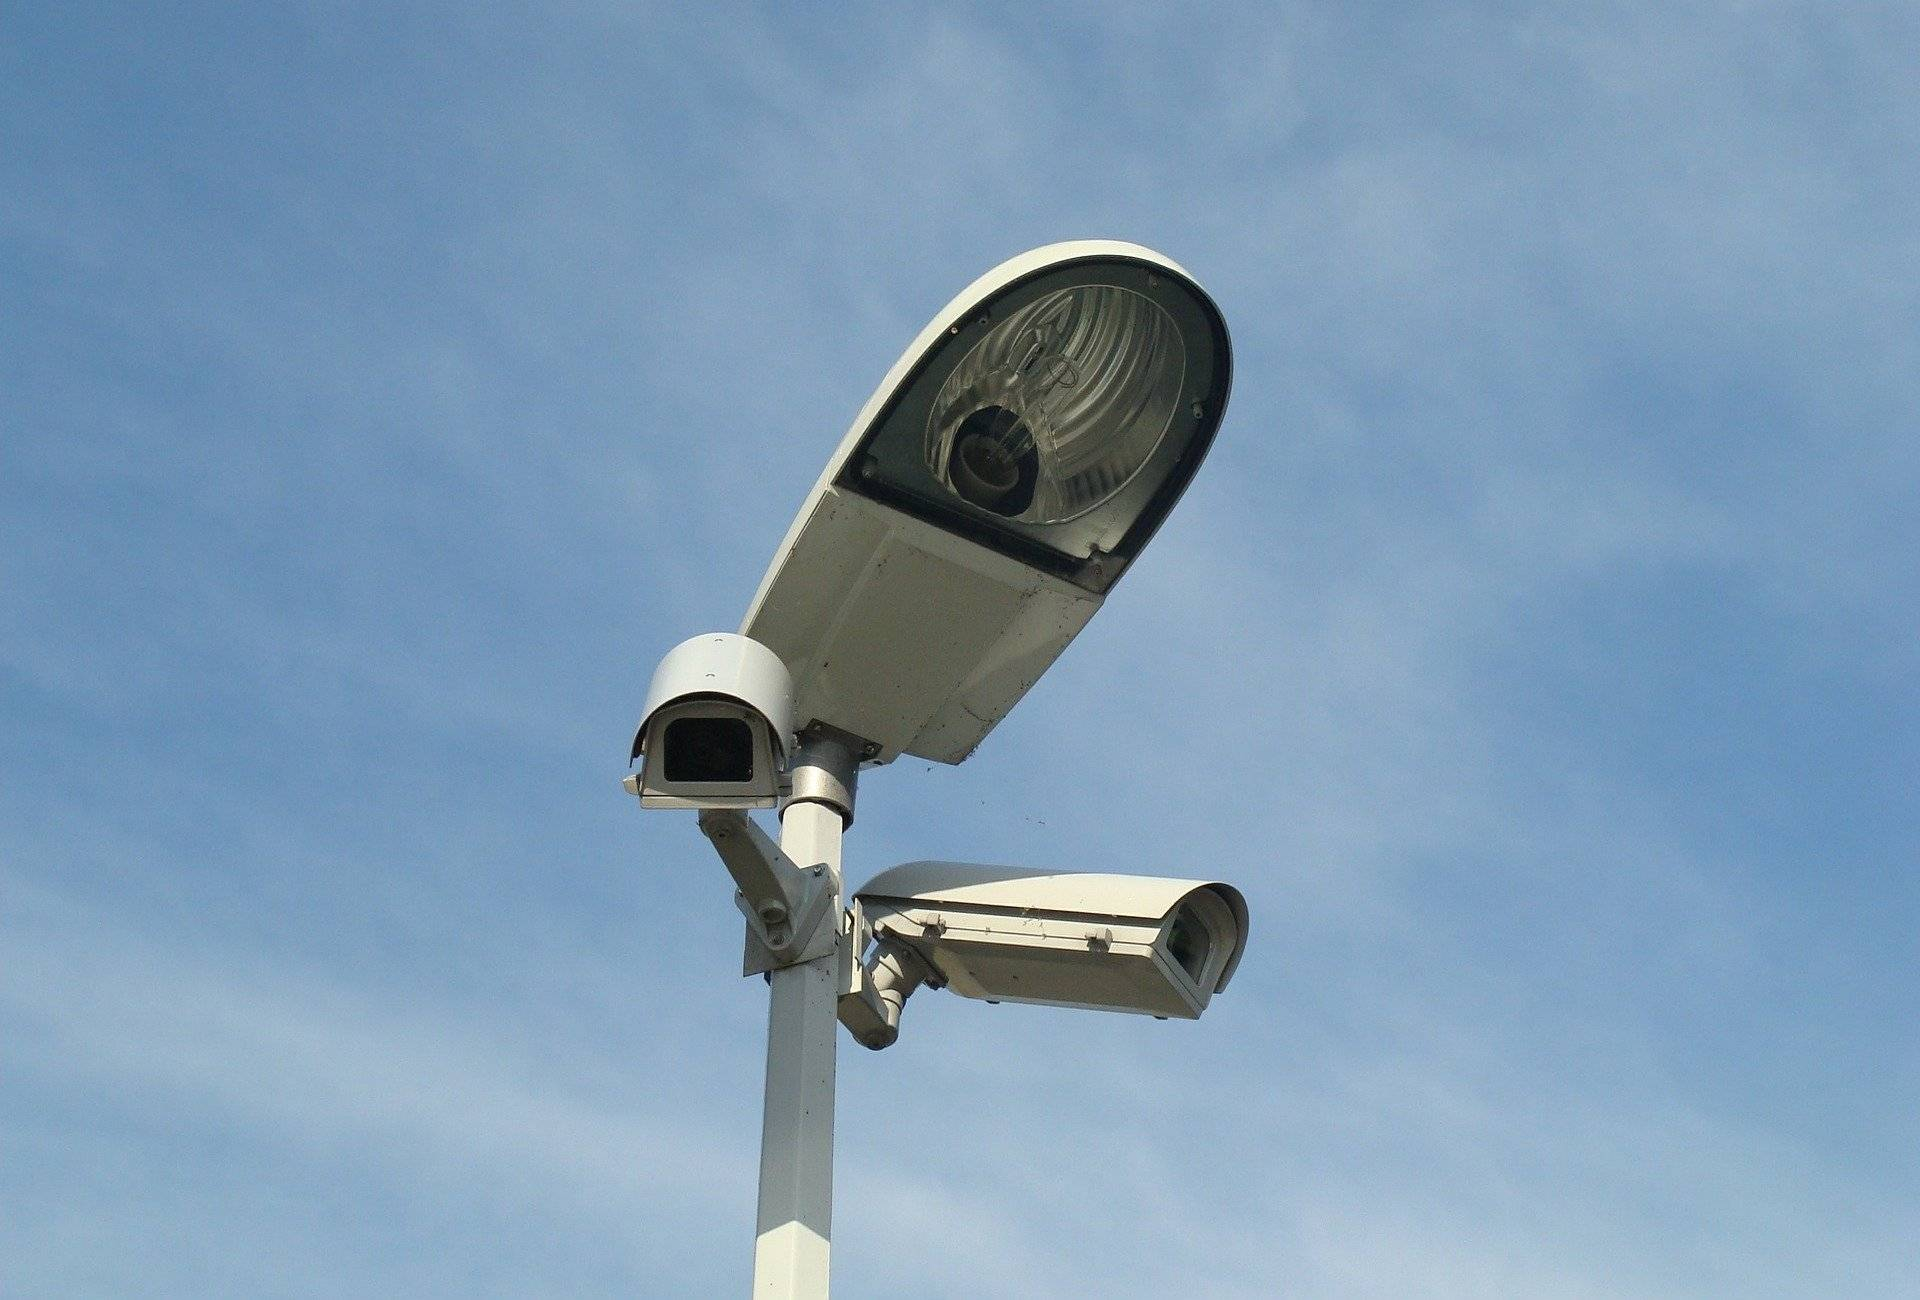 grafika systemy monitoringu kamera na latarni